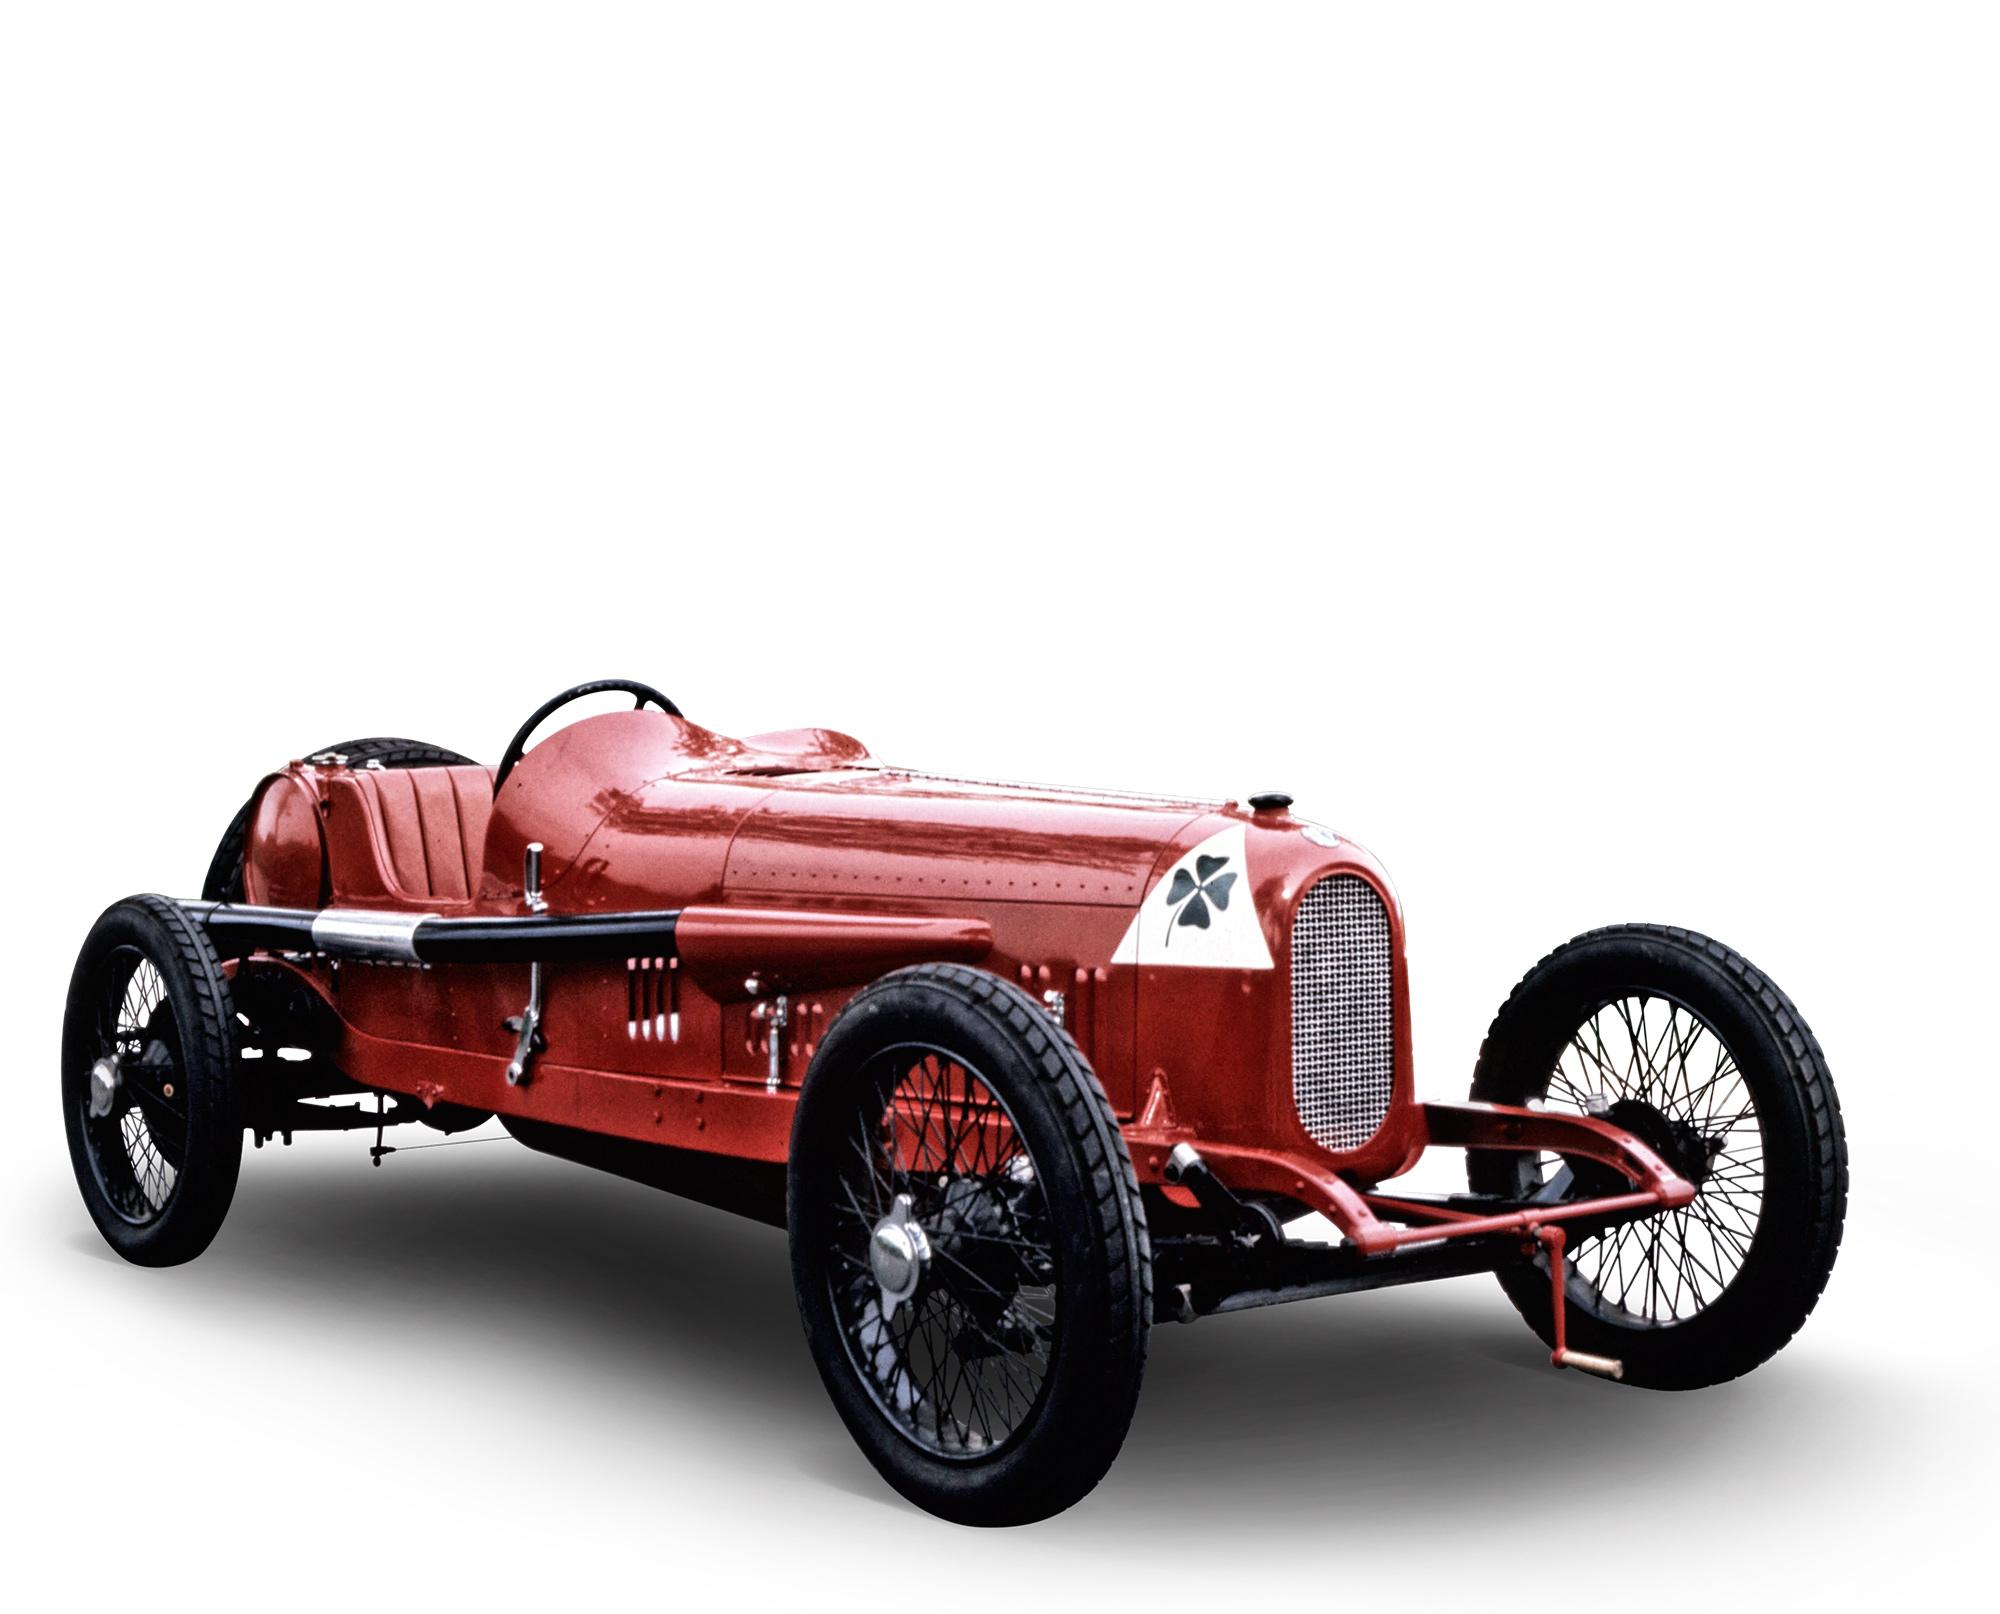 Octane Edition 05 Alfa Romeo Quadrifoglio Verde Targa Florio RL Targa Florio 1923 Filter